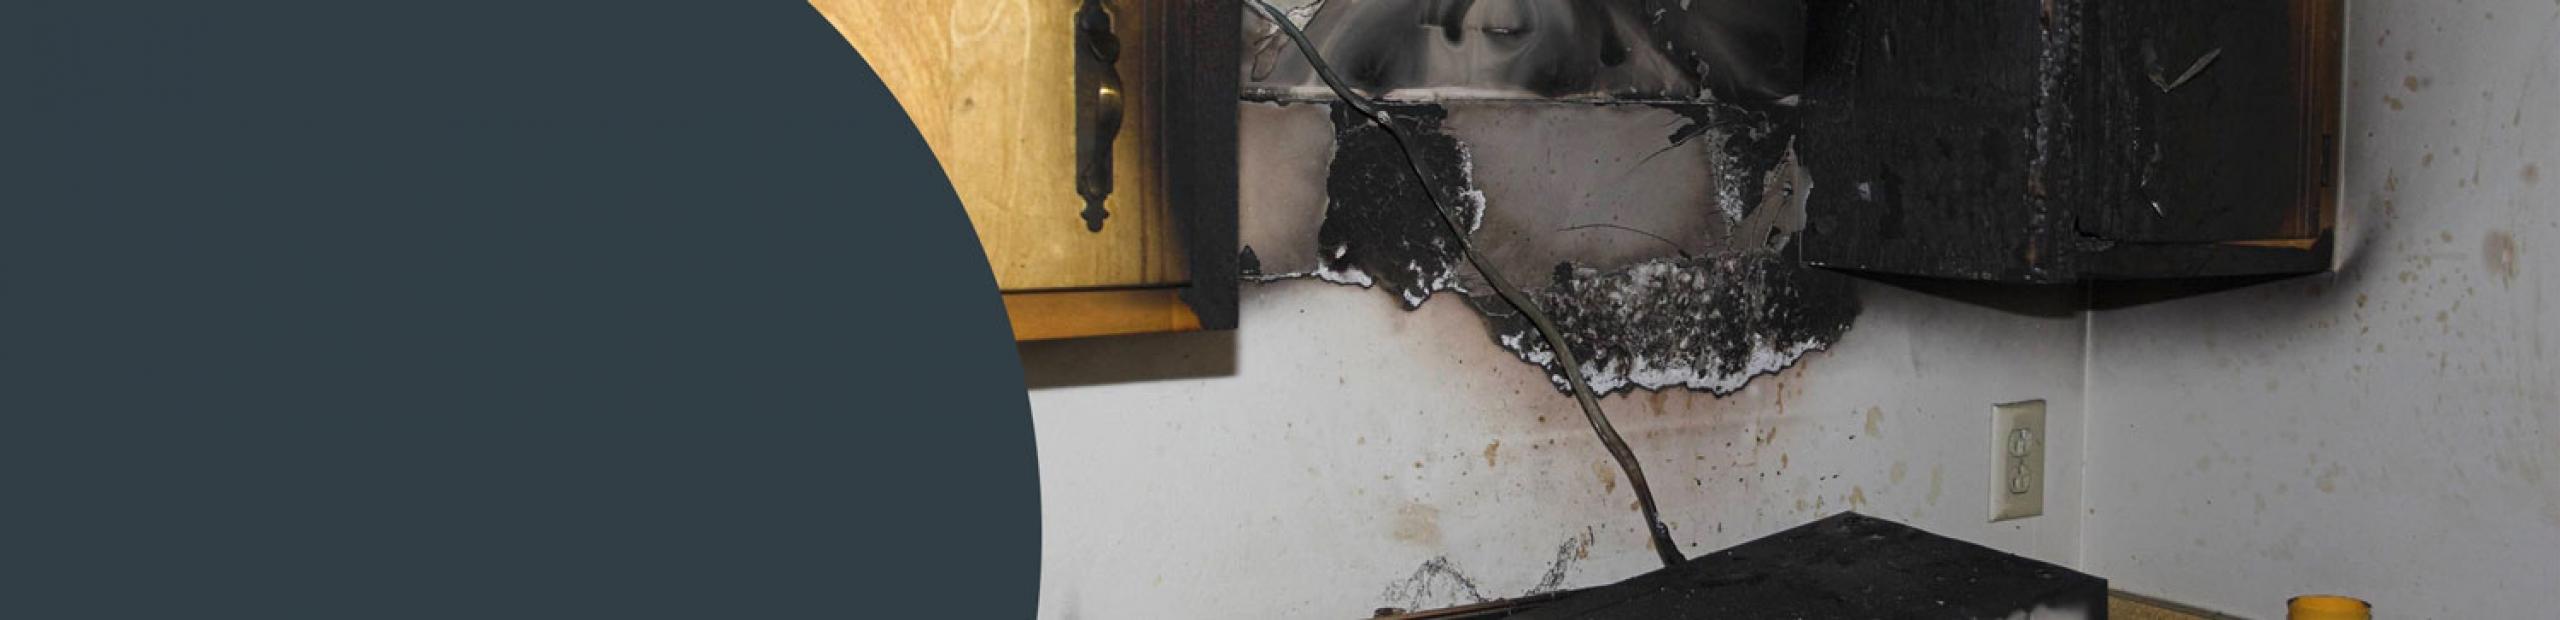 Fire Damage Cleaning Croydon